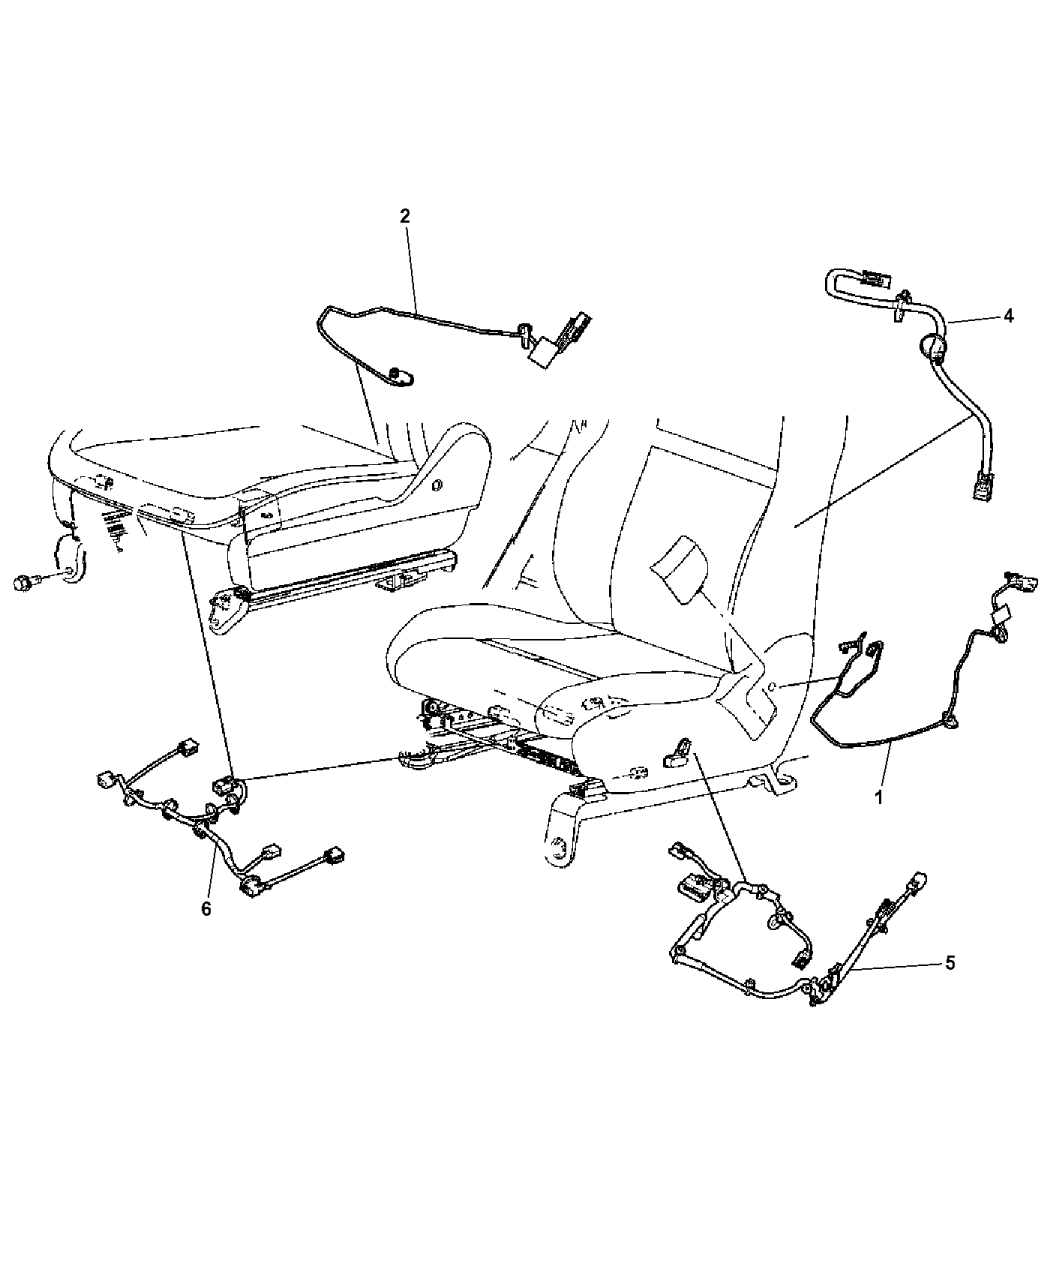 68101140AA - Genuine Mopar WIRING-SIDE AIR BAG